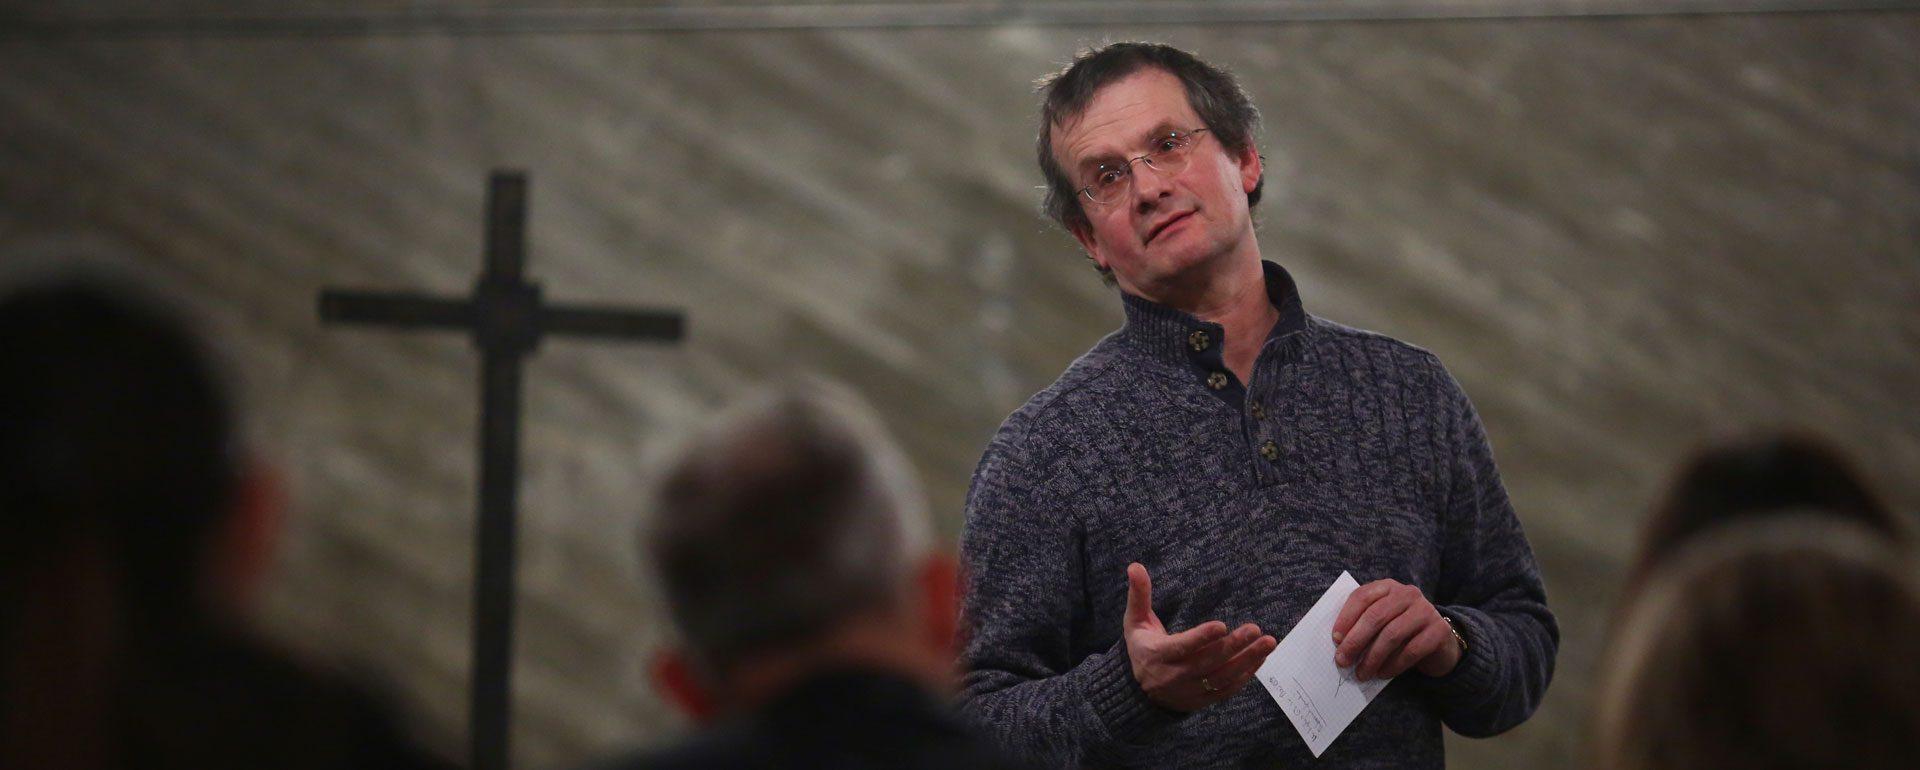 markus melchers das philosophische cafe kulturkirche ost köln gag